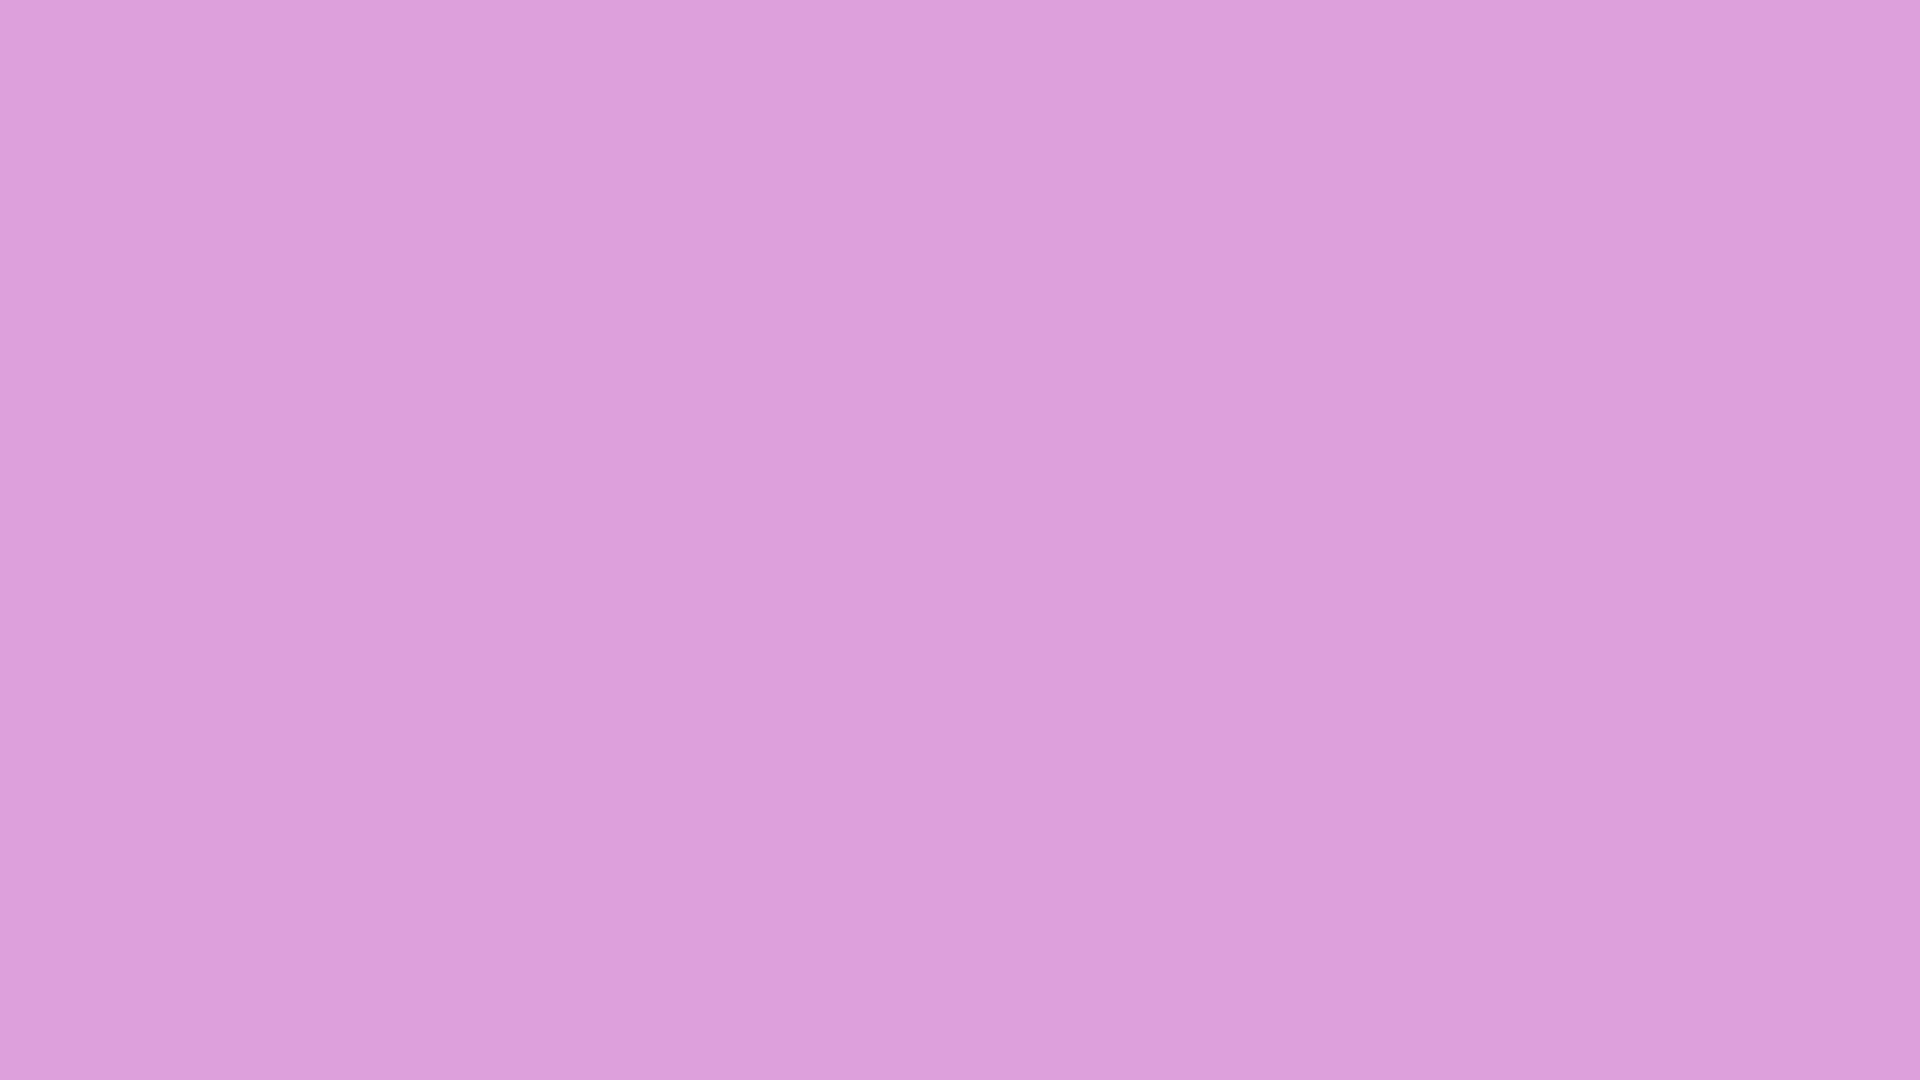 1920x1080 Pale Plum Solid Color Background